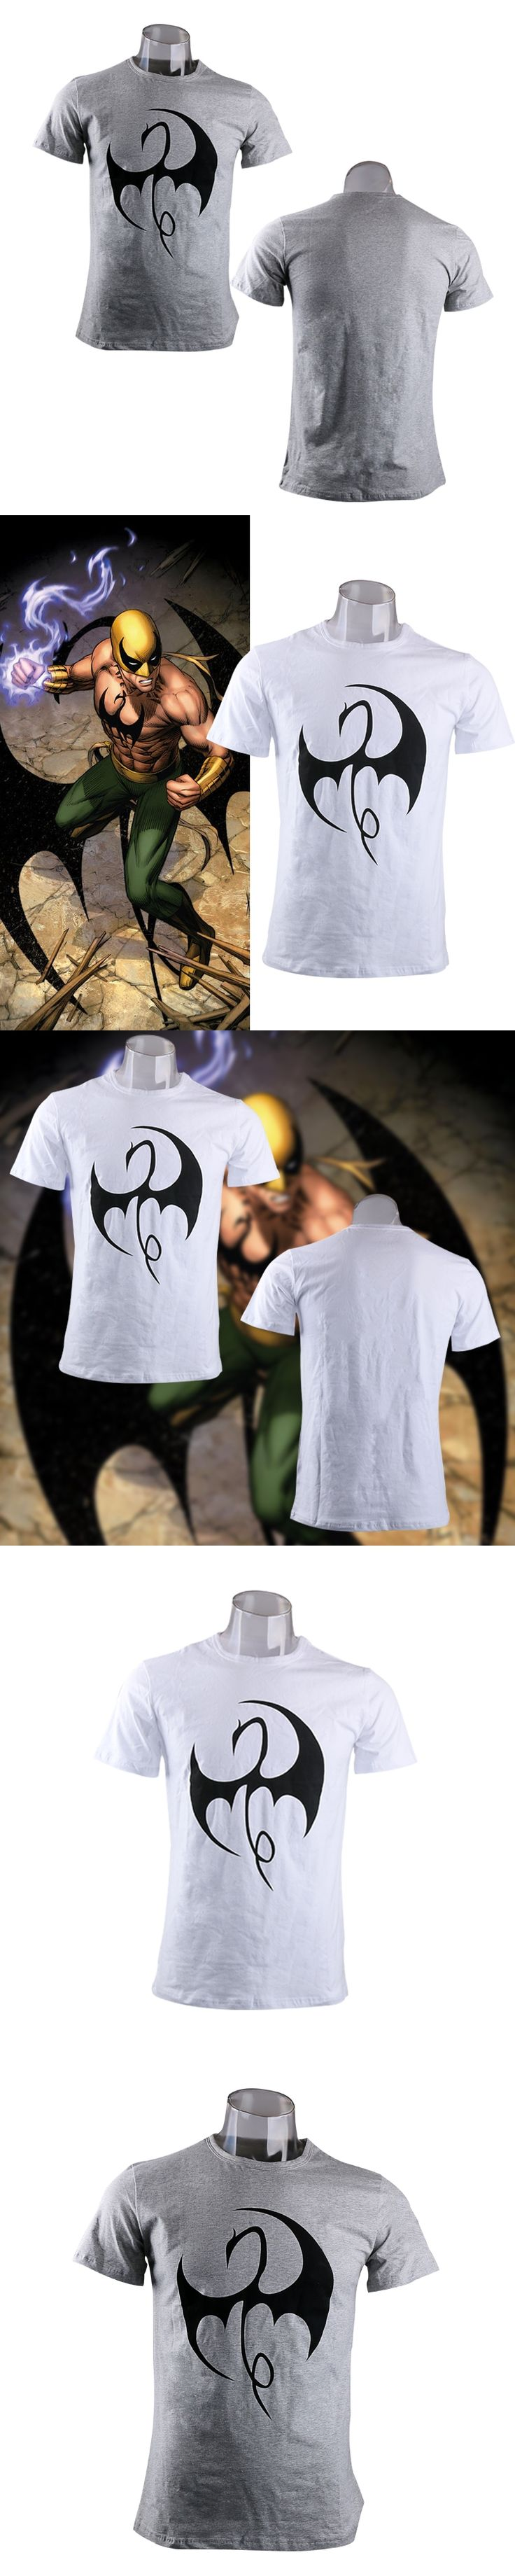 Mens Casual 2017 TV Series Iron Fist Daniel Rand Superhero Logo Cosplay O-Neck Printing Short Sleeve Cotton T-shirts Tee Shirts